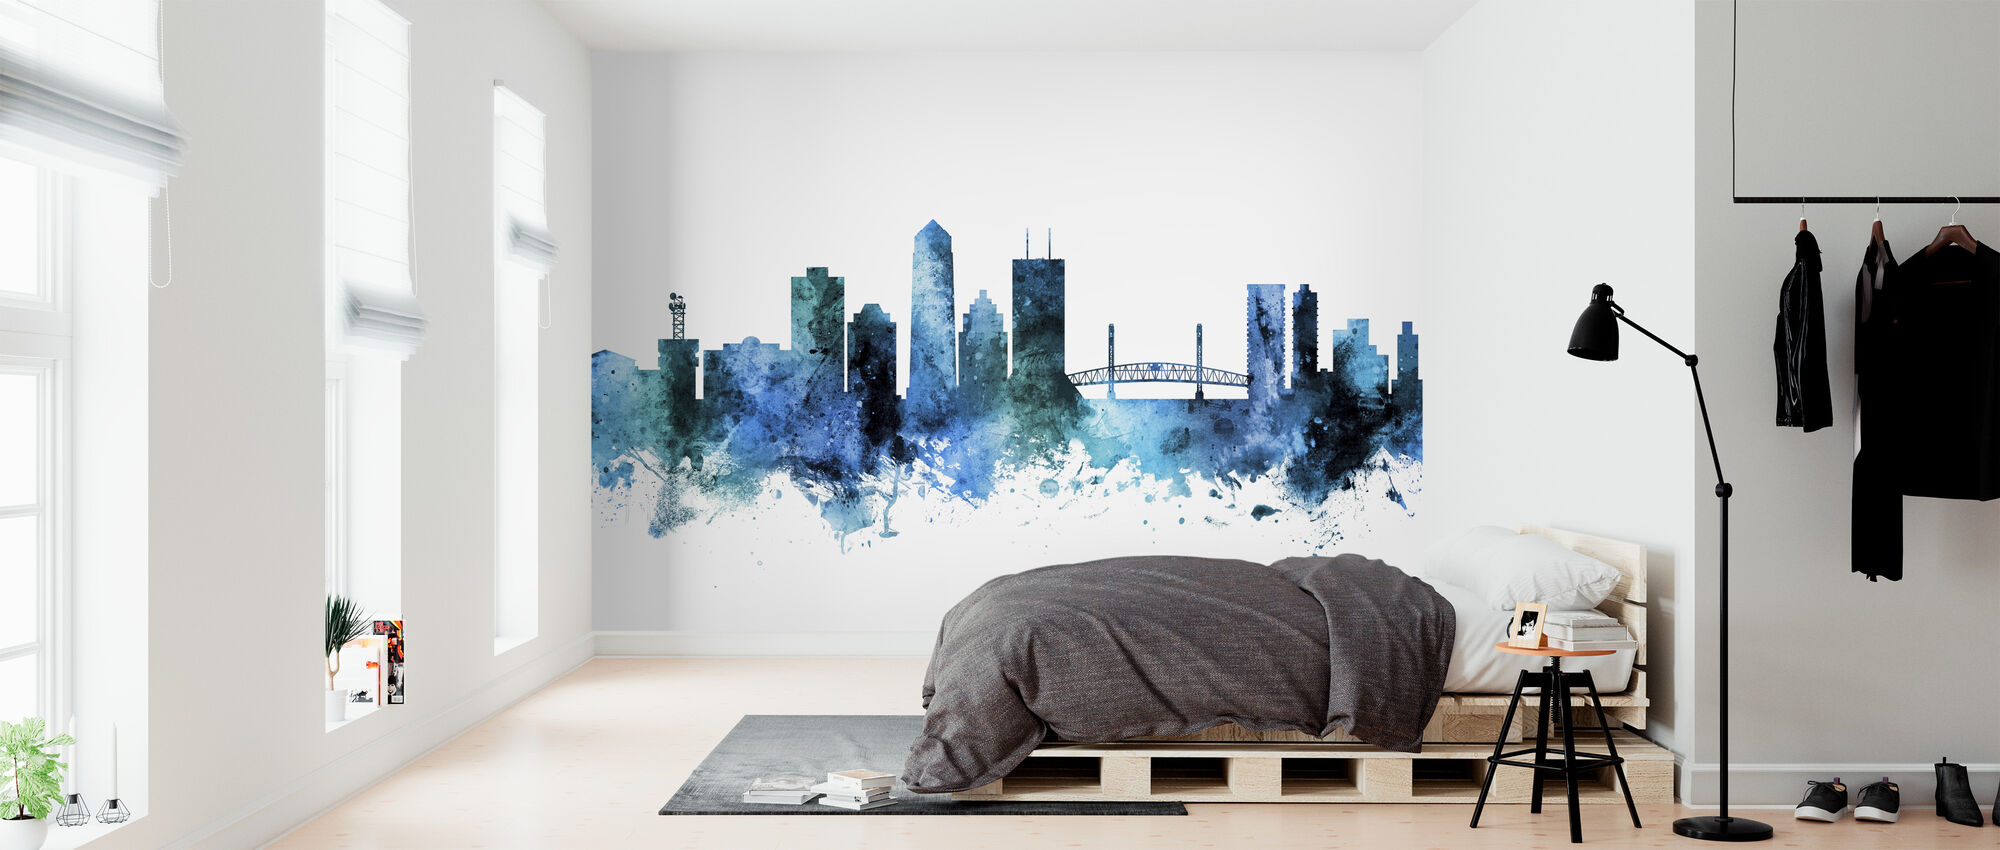 Jacksonville Florida Skyline - Wallpaper - Bedroom